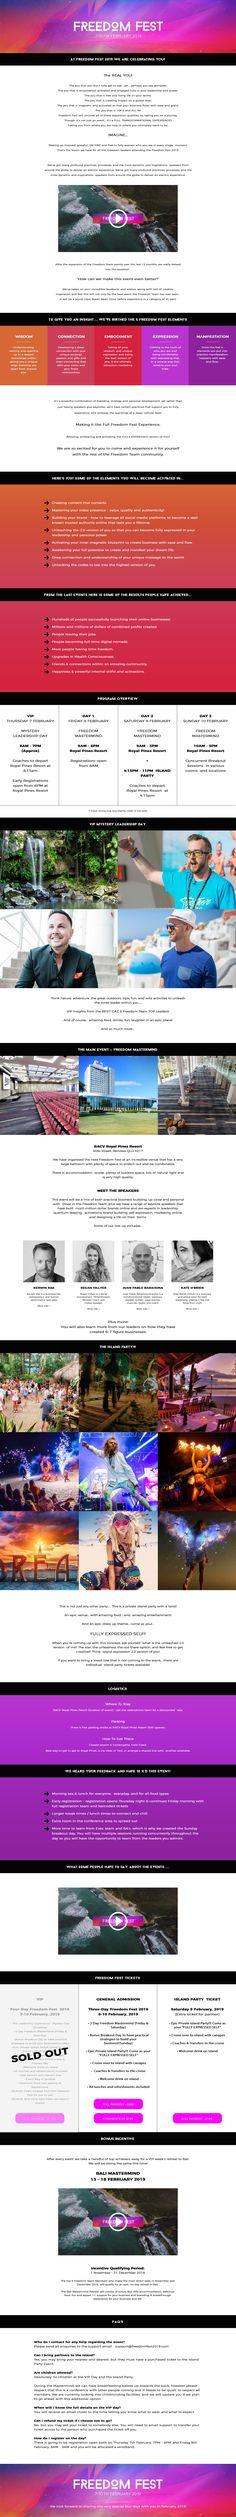 www.freedomfest.com Entrepreneur, Personal Branding, Page Design, Branding Design, Corporate Design, Identity Branding, Self Branding, Brand Design